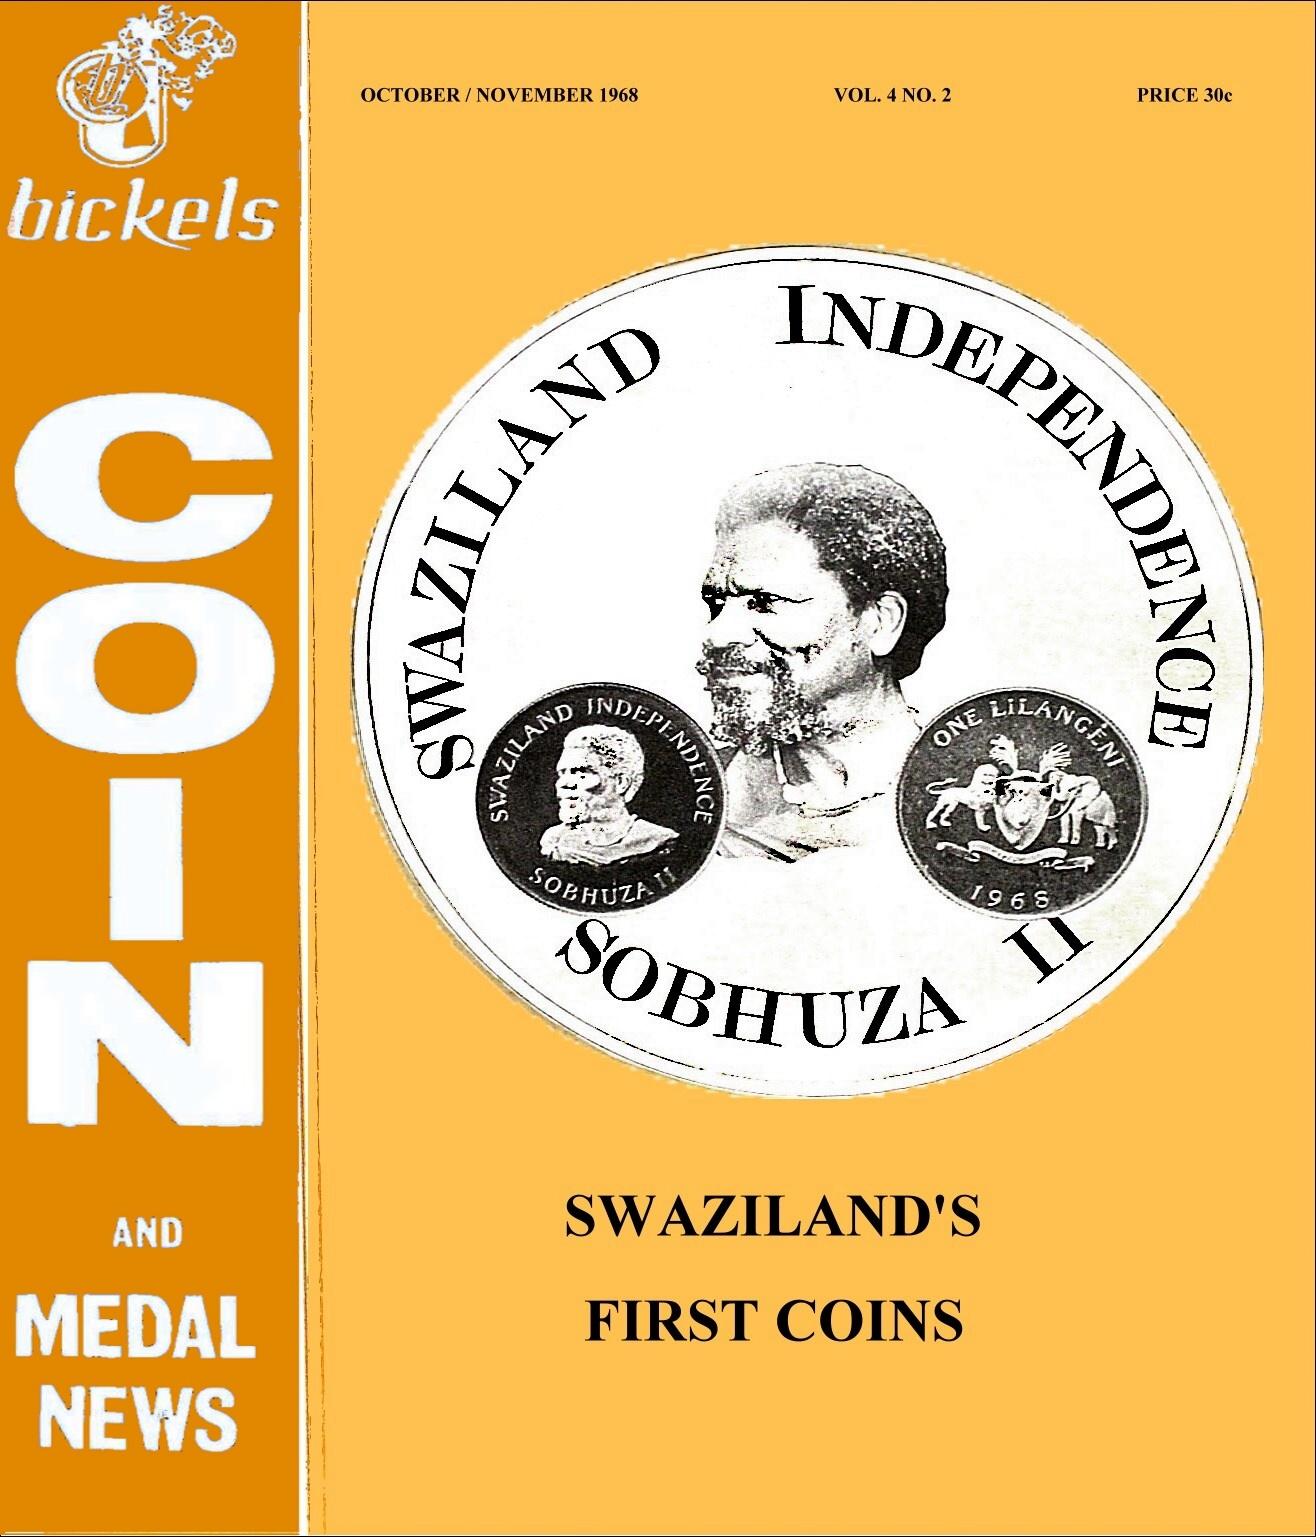 Bickels Coin & Medal News October November 1968 Vol 4 No 2